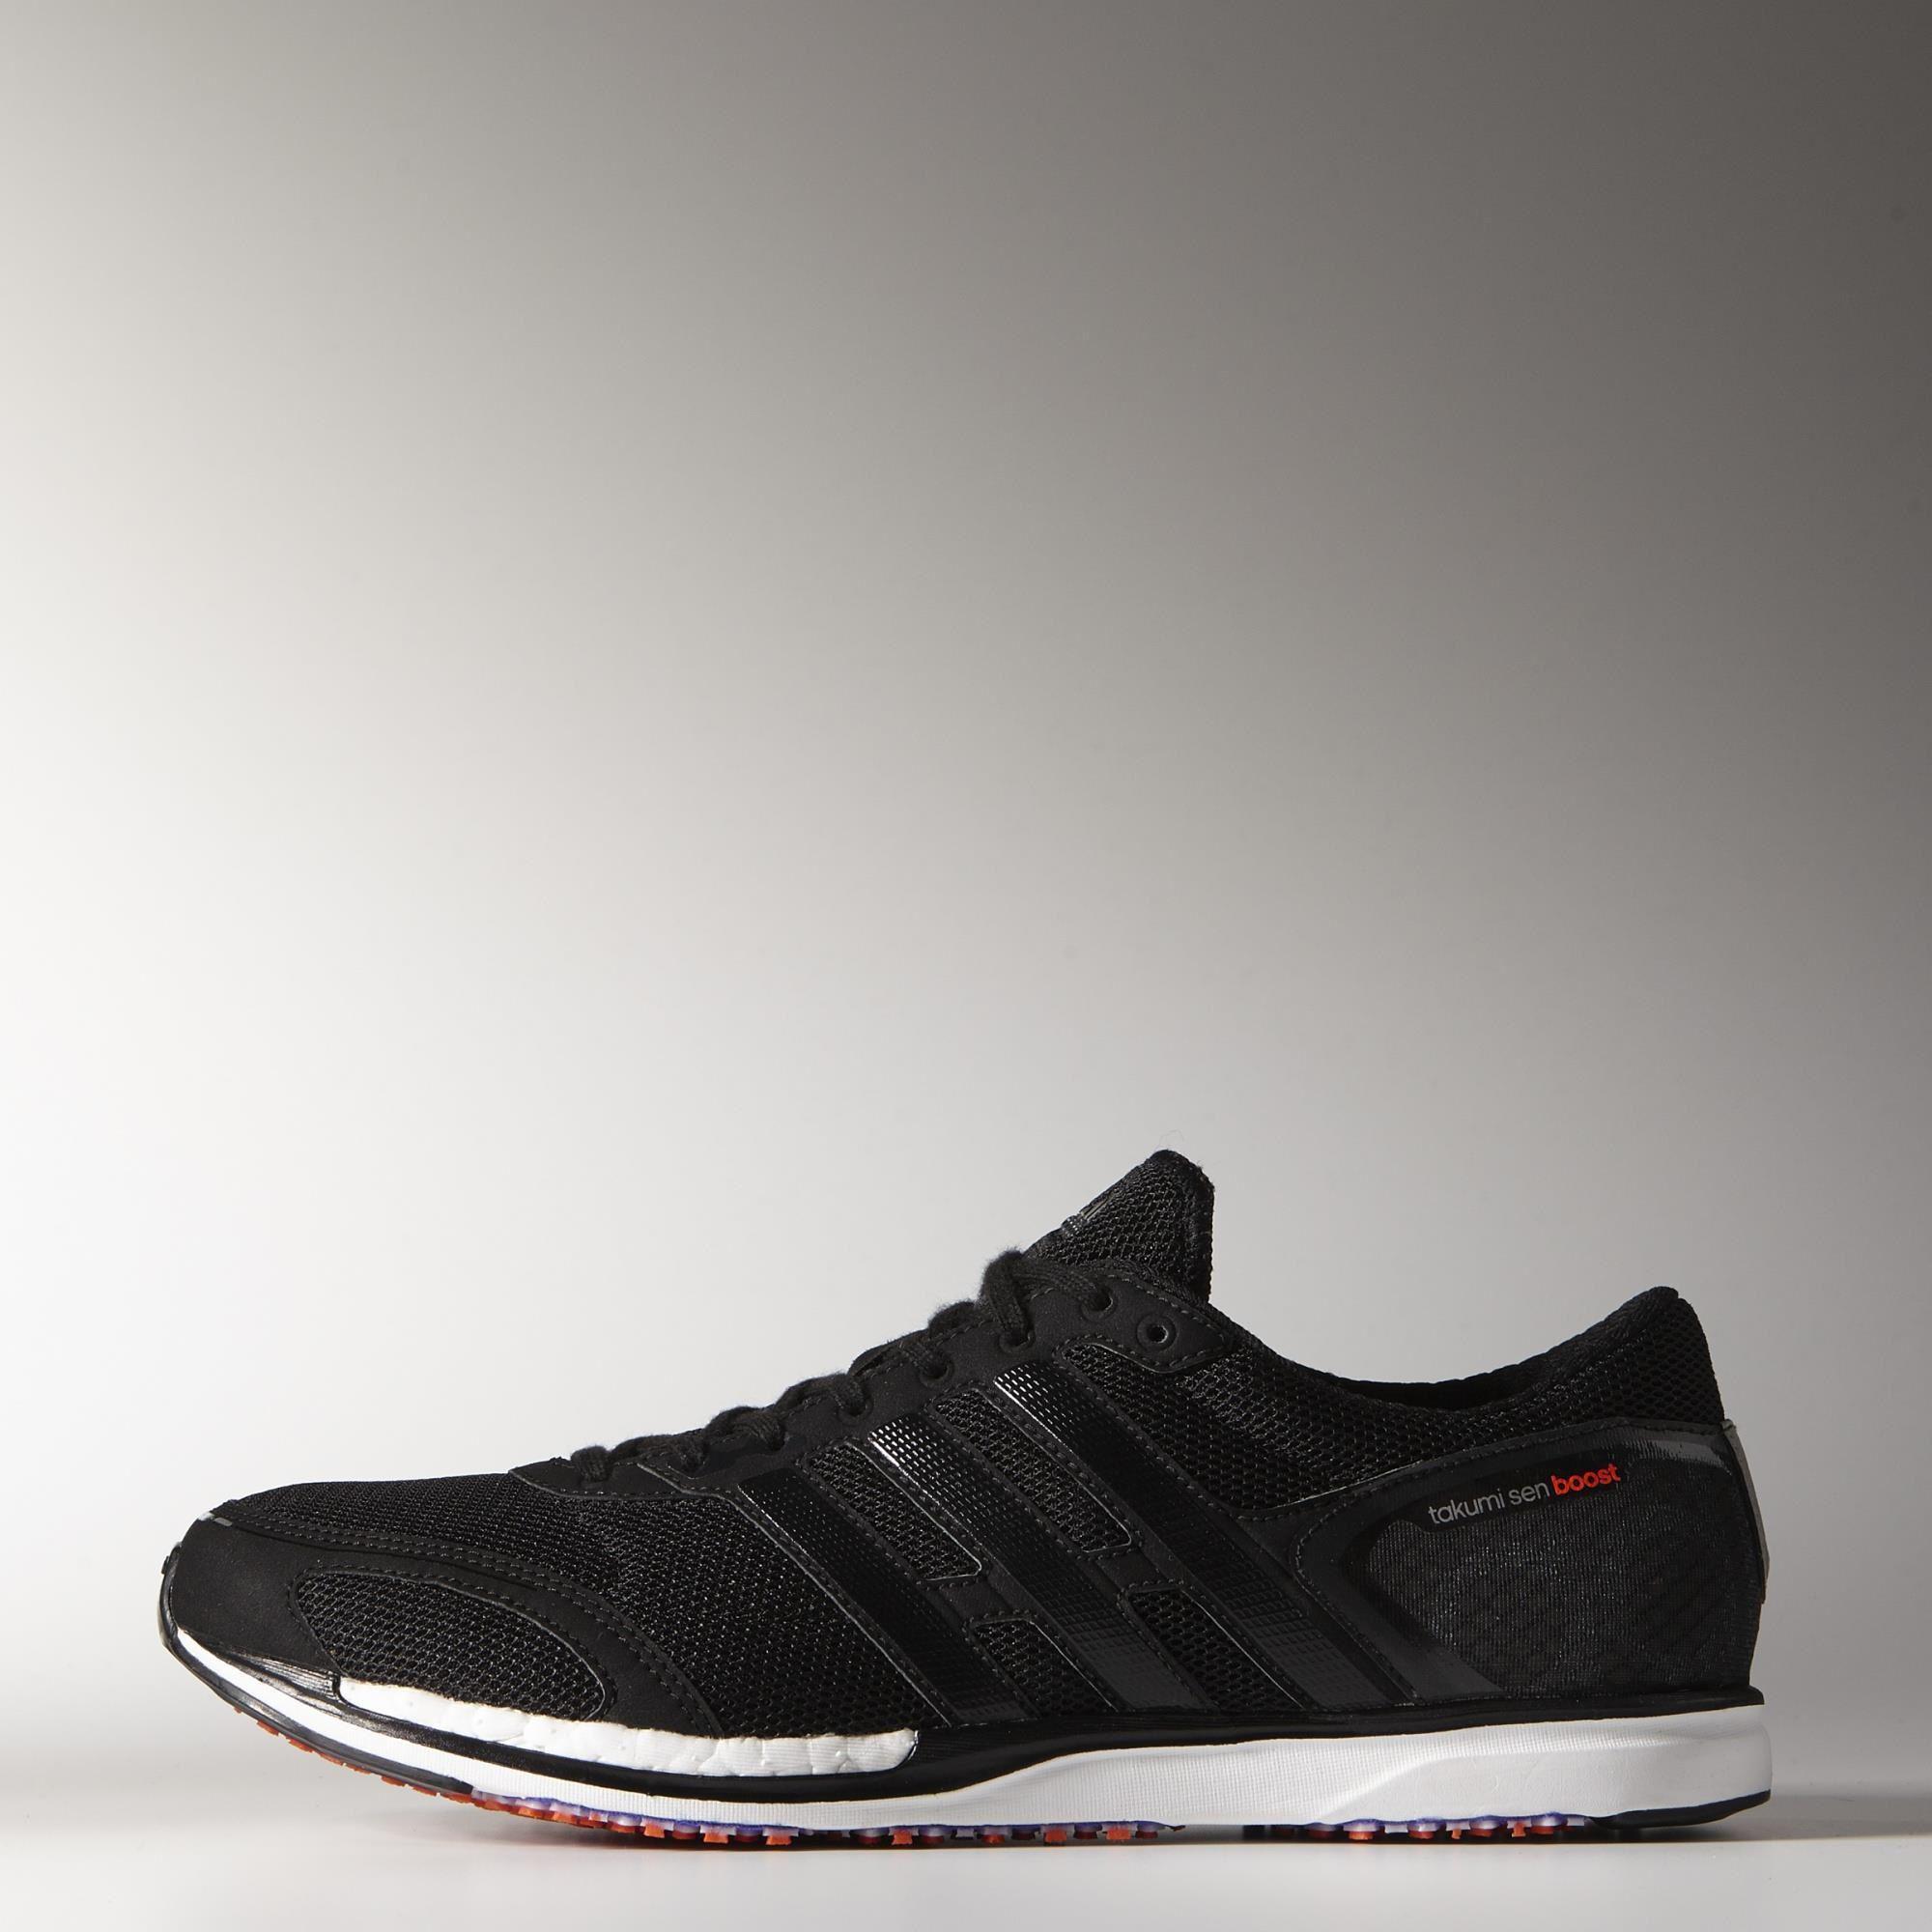 de7474460fc Adidas Mens Adizero Takumi Sen Boost 3 Running Shoes - Black White -  Tennisnuts.com